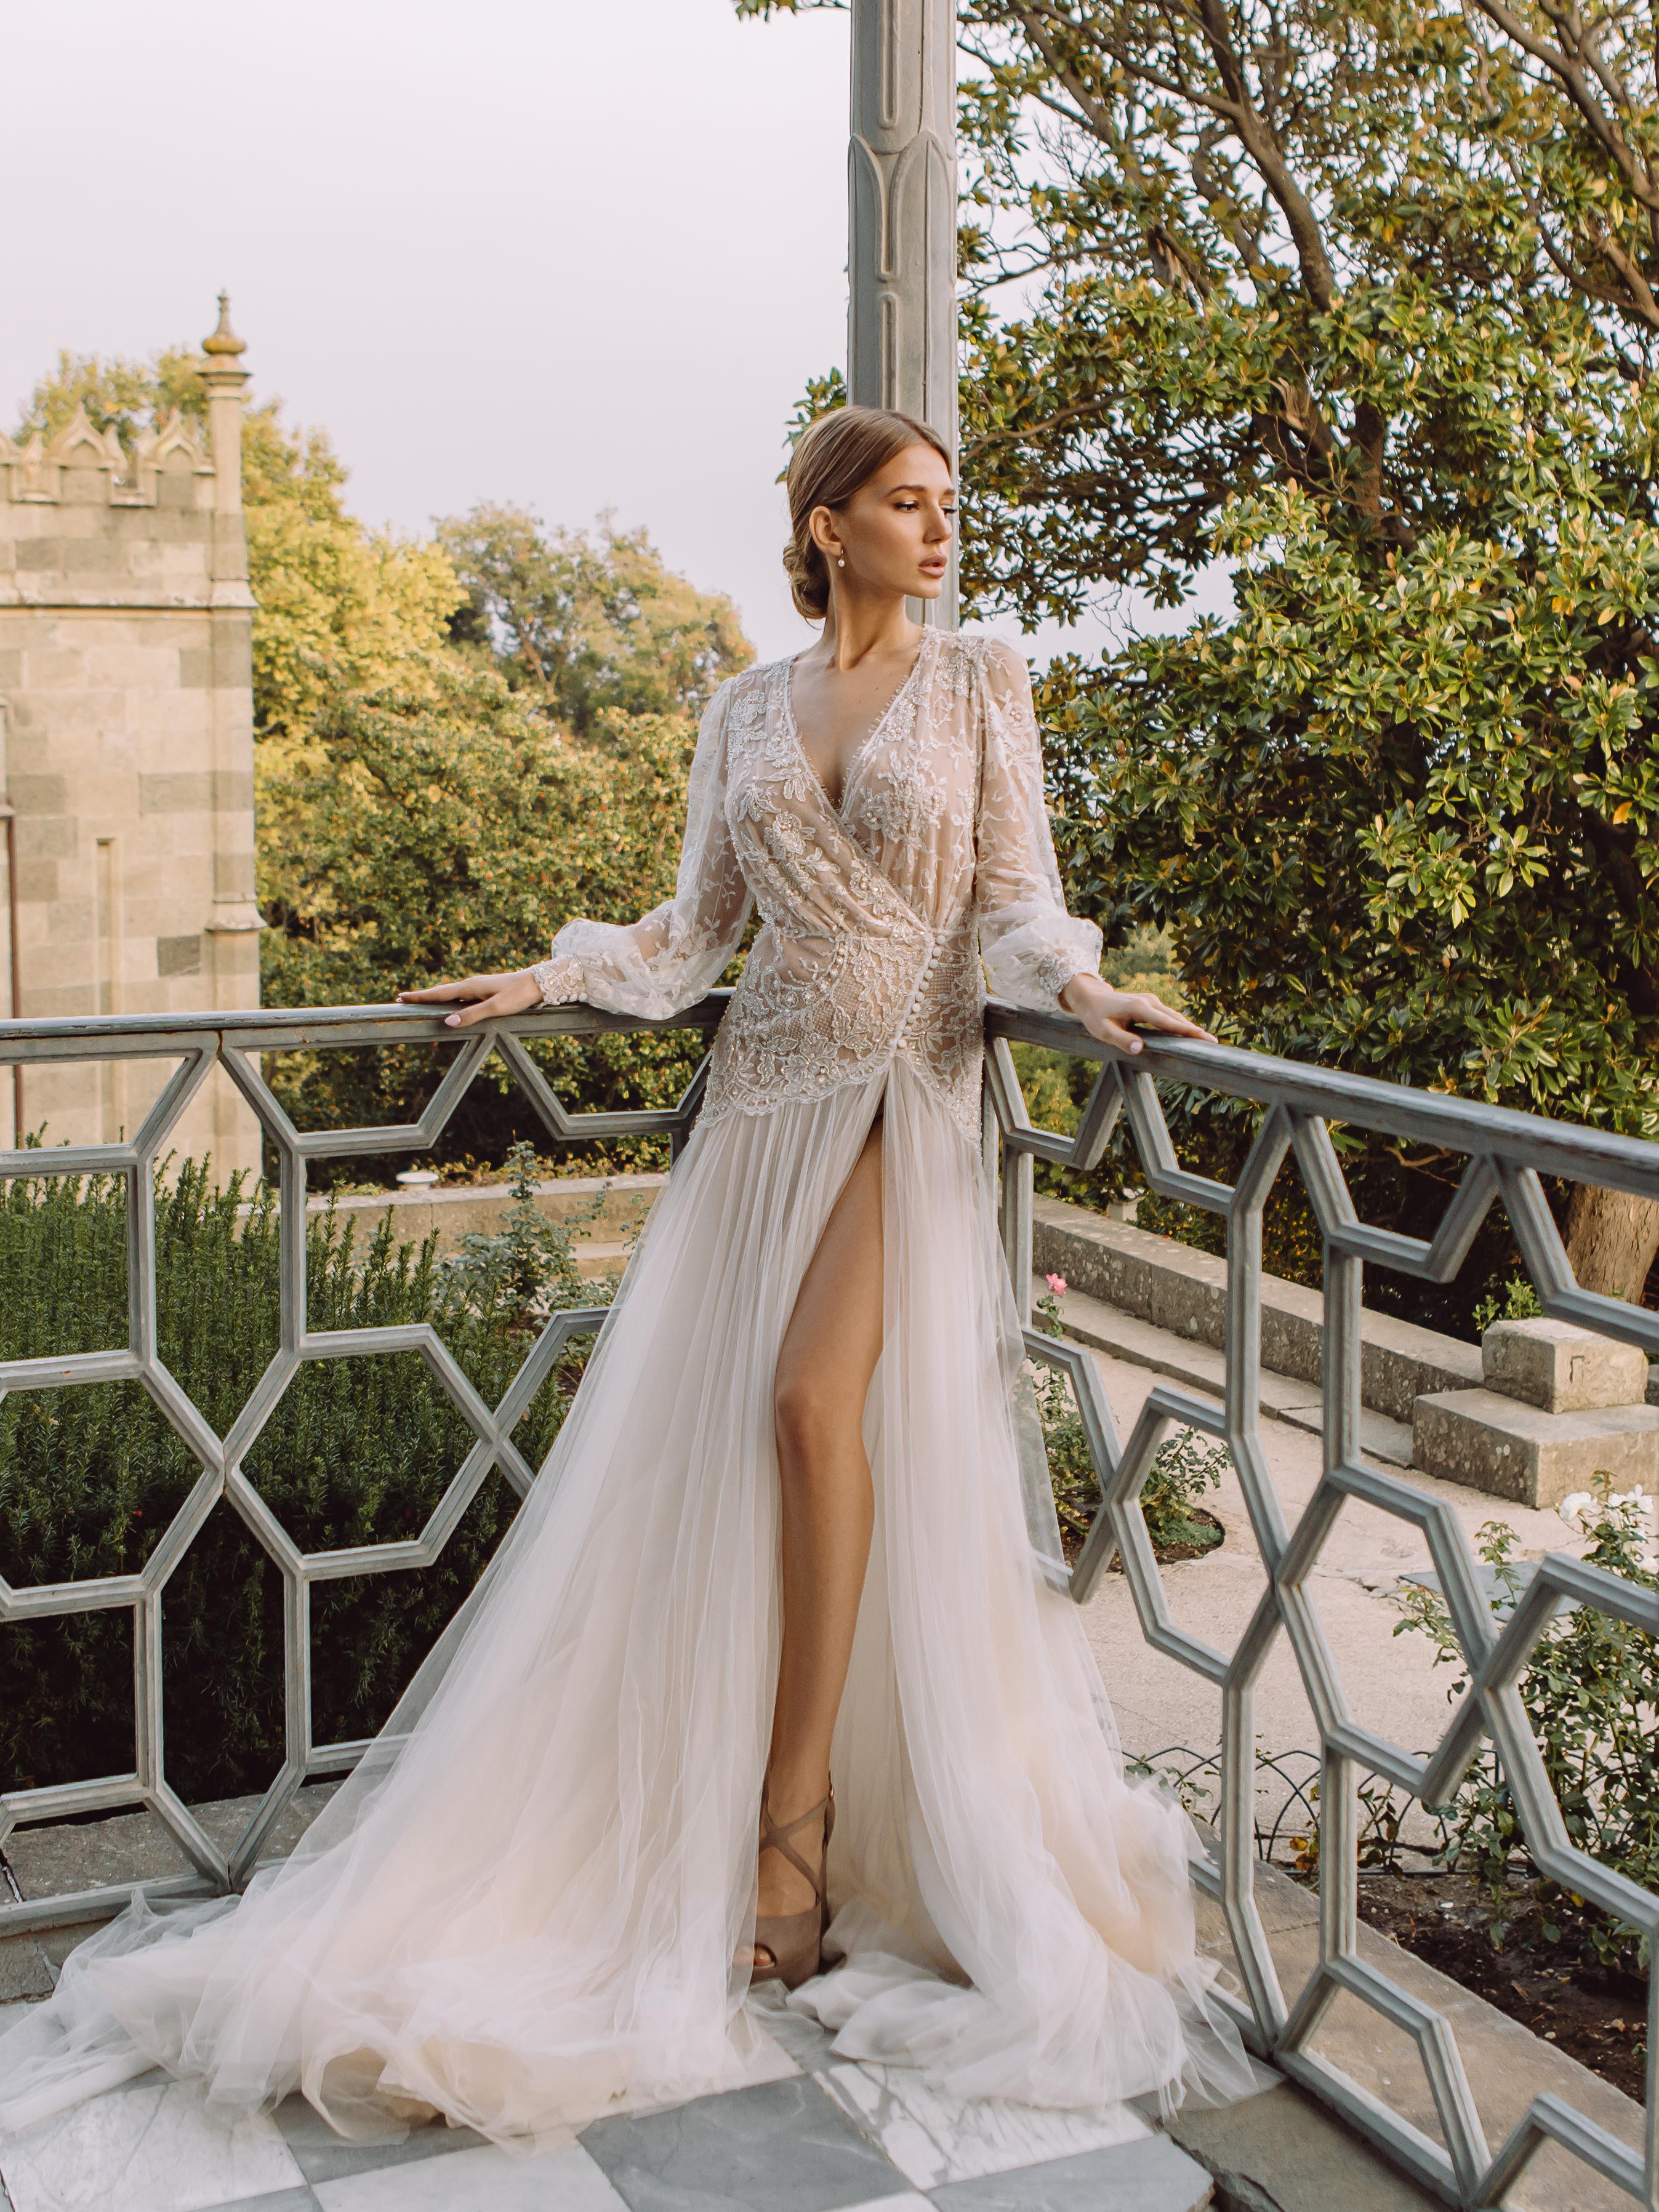 Garden wedding dress - 0165 - Rosa Landora : Photo 3